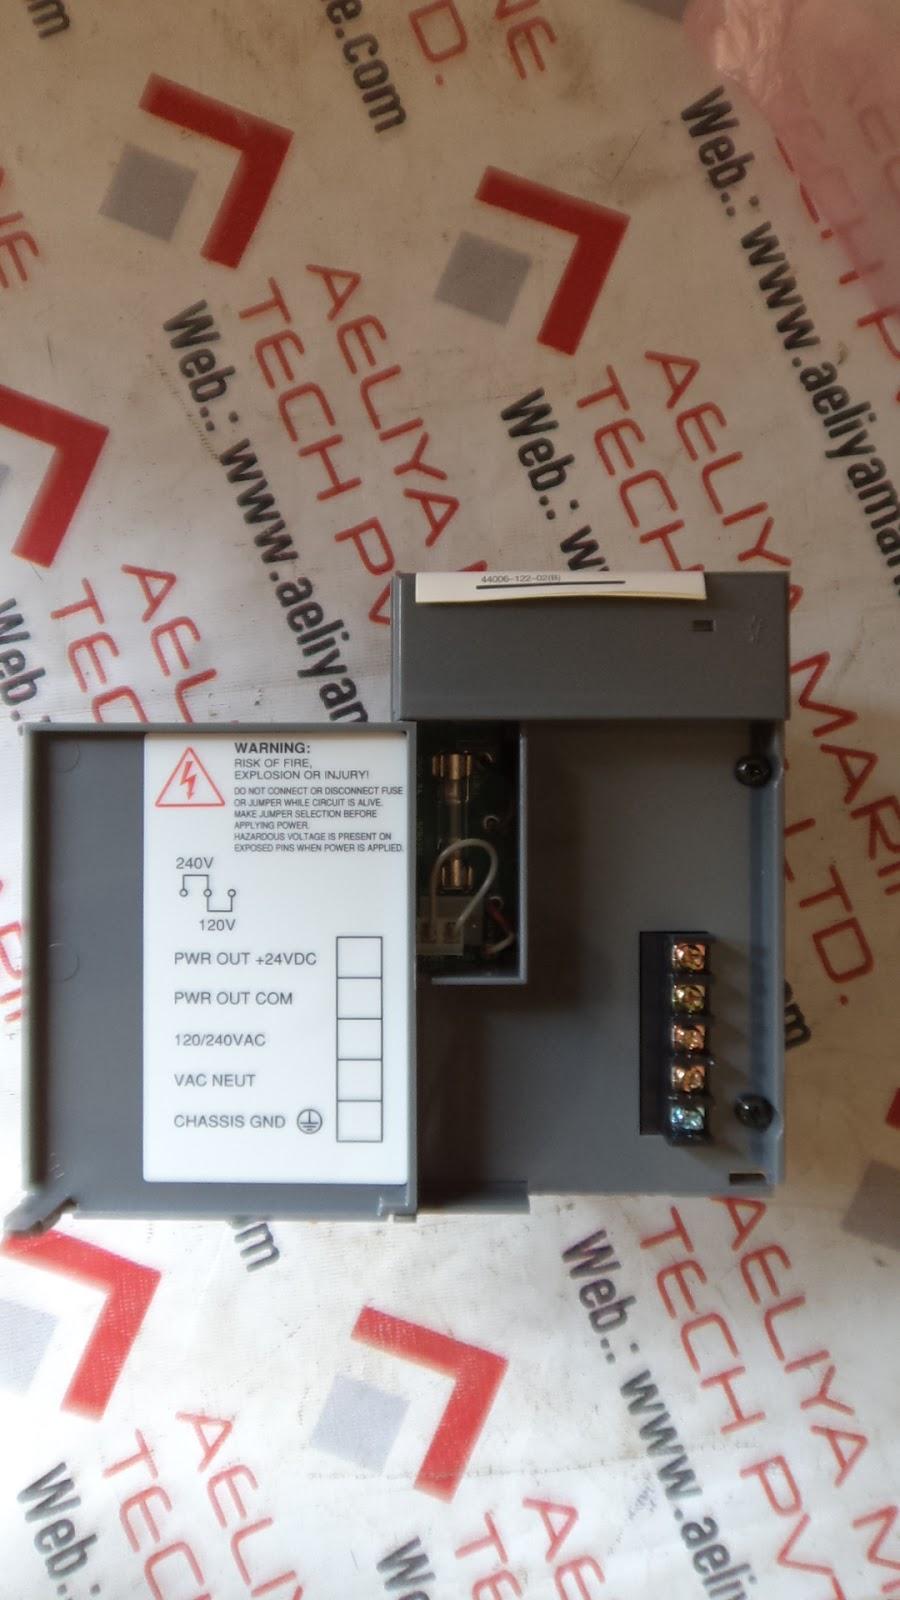 Aeliya Marine Tech Pvt Ltd | ALLEN BRADLEY SLC 500 POWER SUPPLY 1746